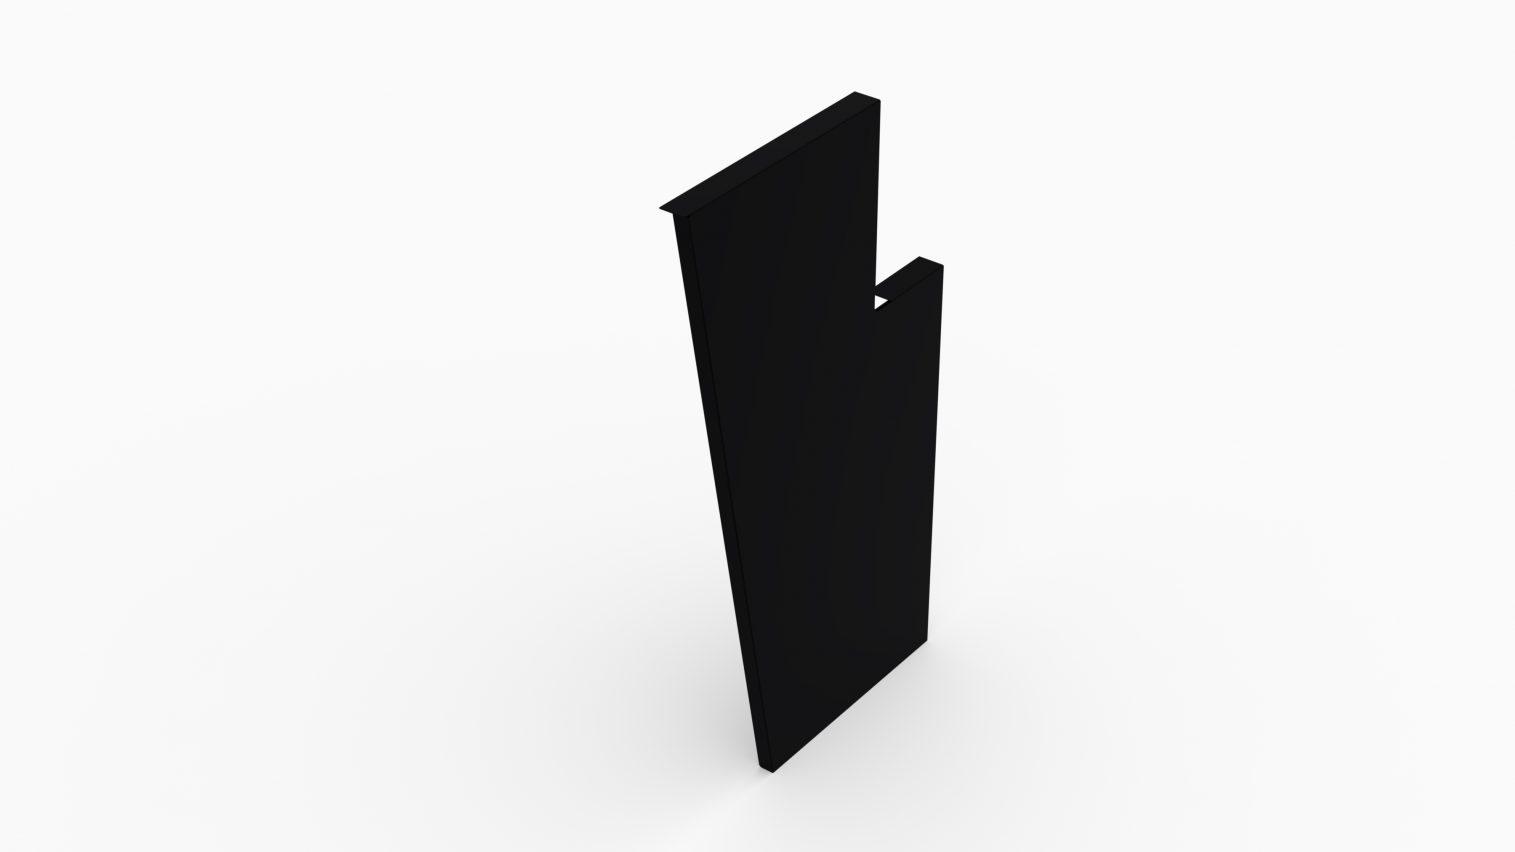 Barlok® End Panel LH x 1